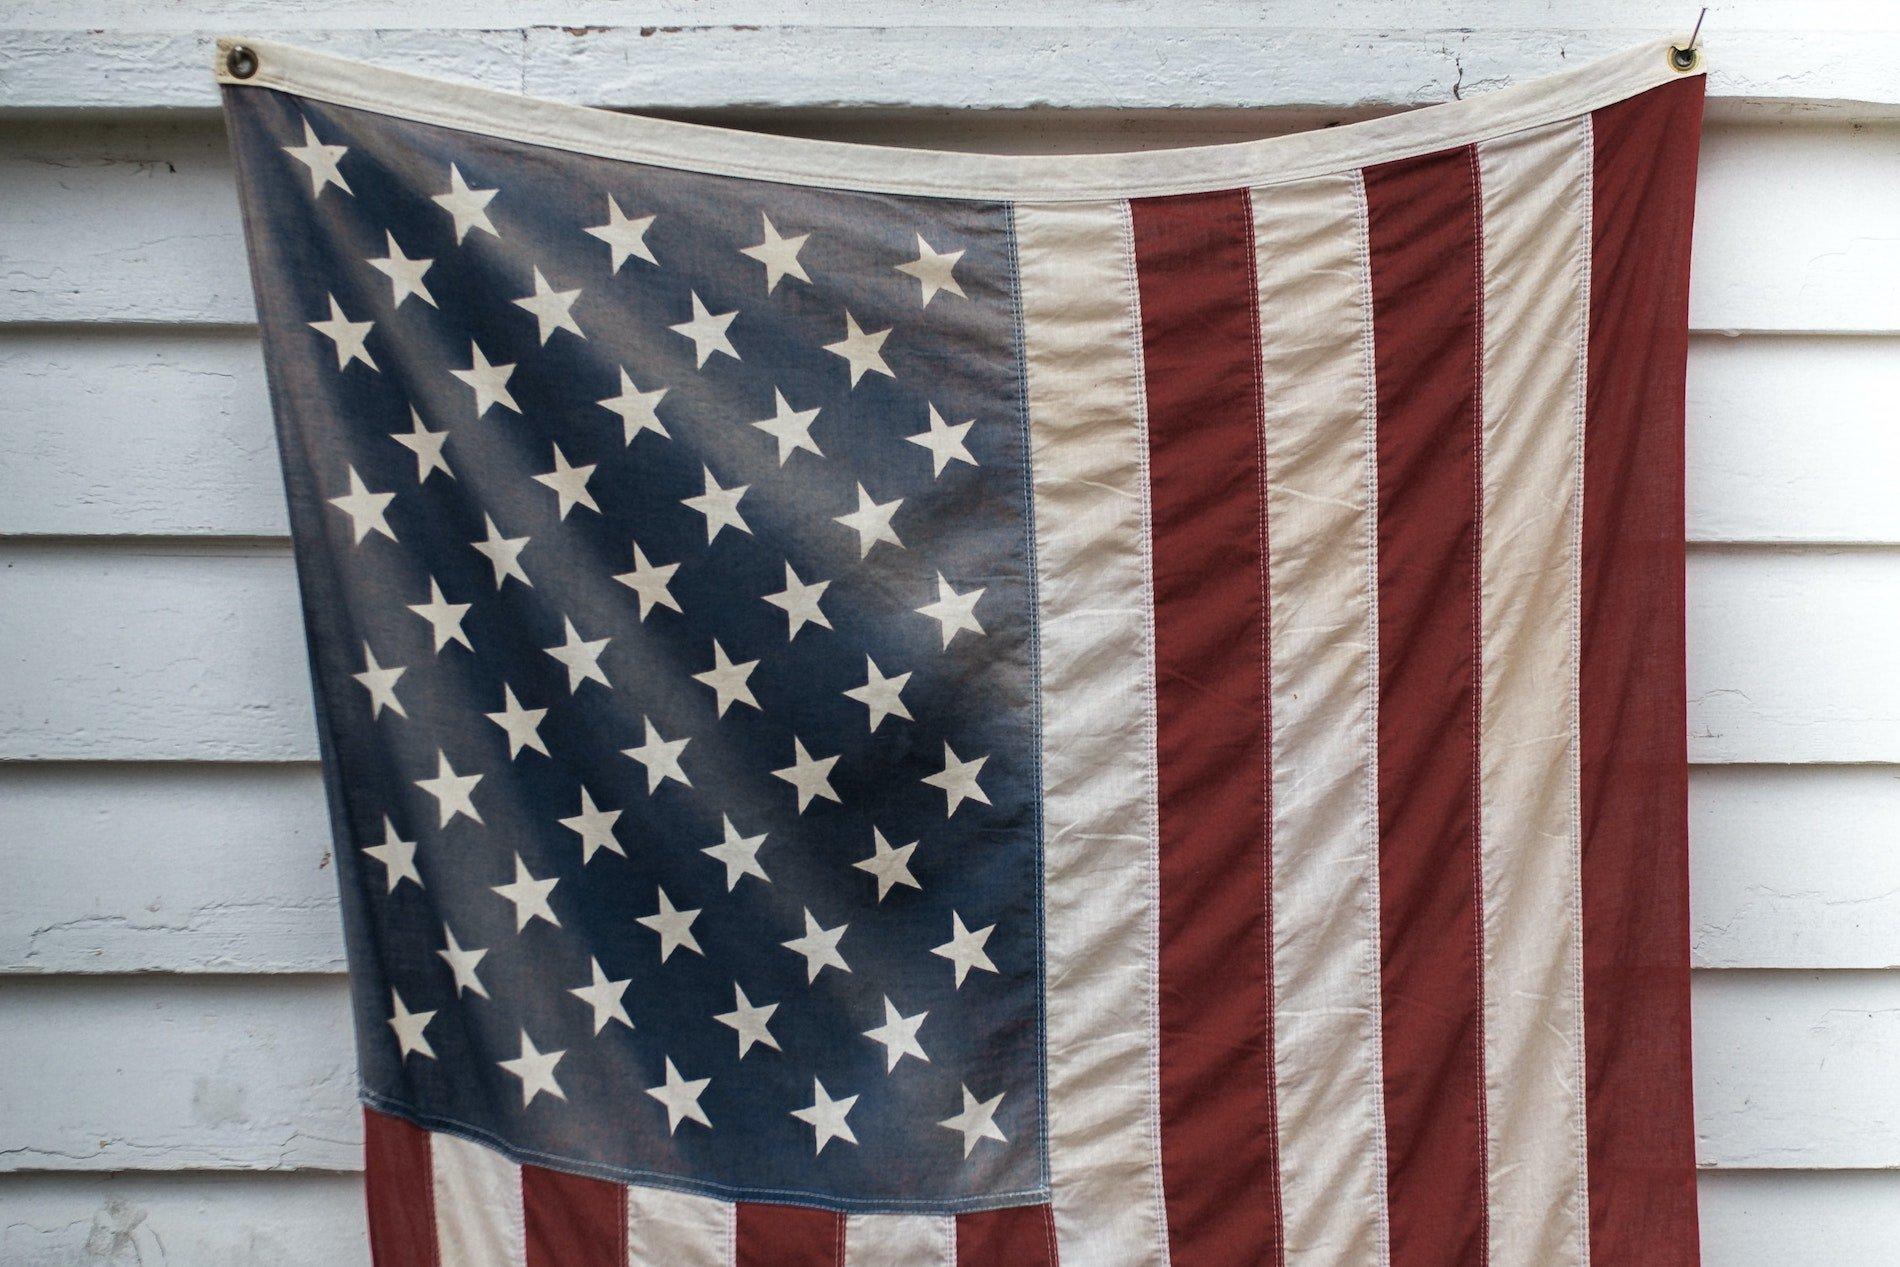 American flag displayed on house